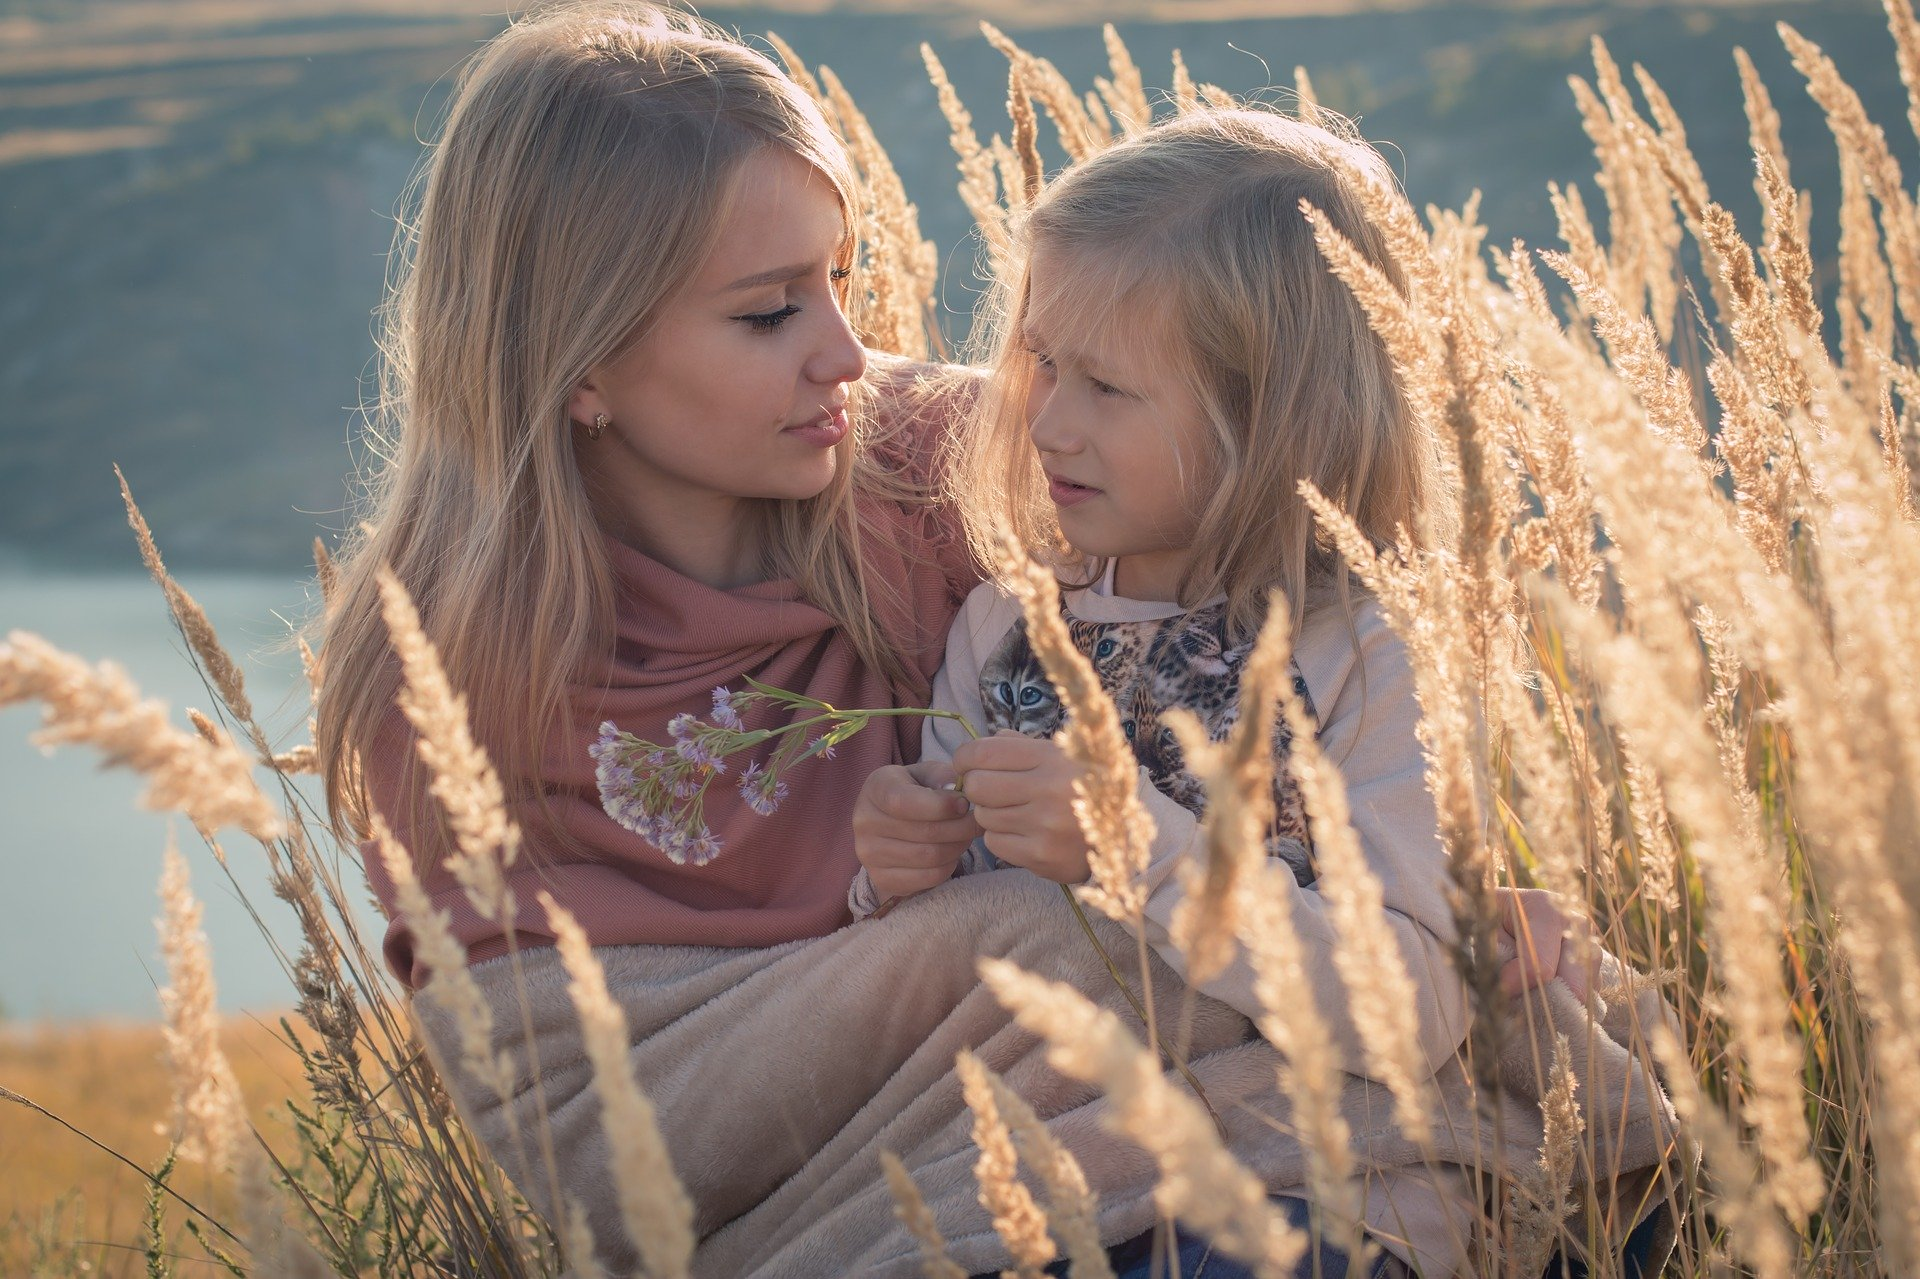 motheranddaughter02